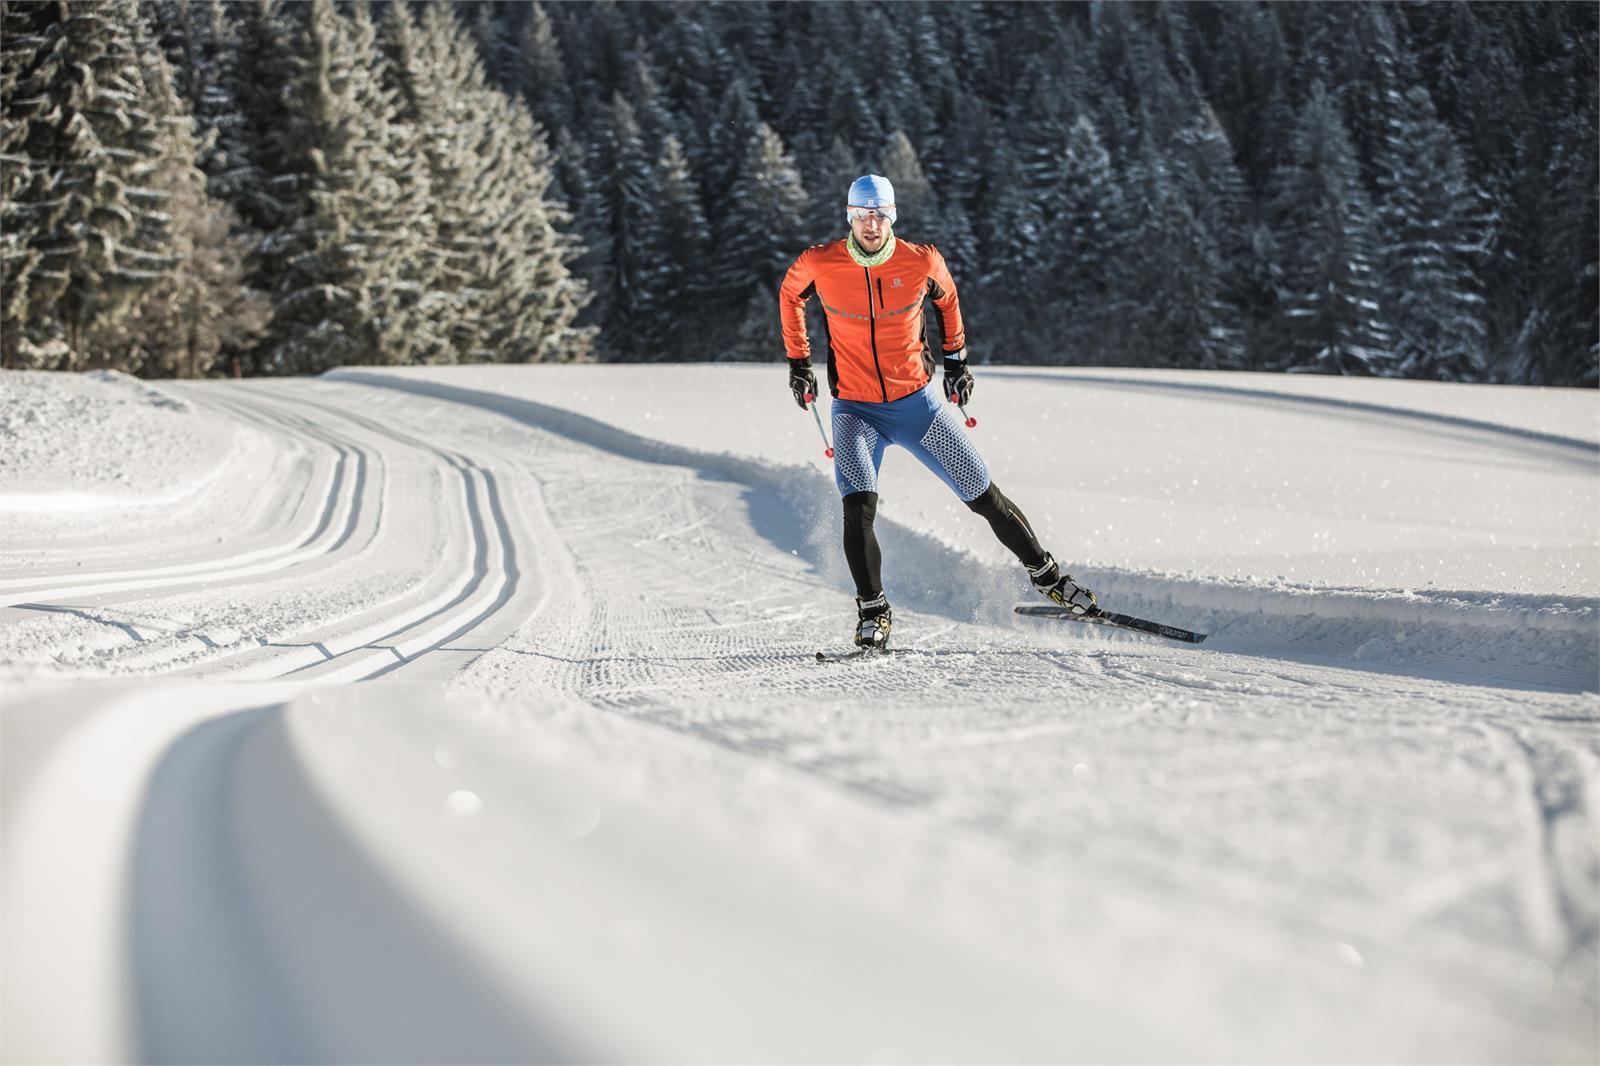 Langlaufen im Salzburger Land   ©SLT - Michael Groessinger